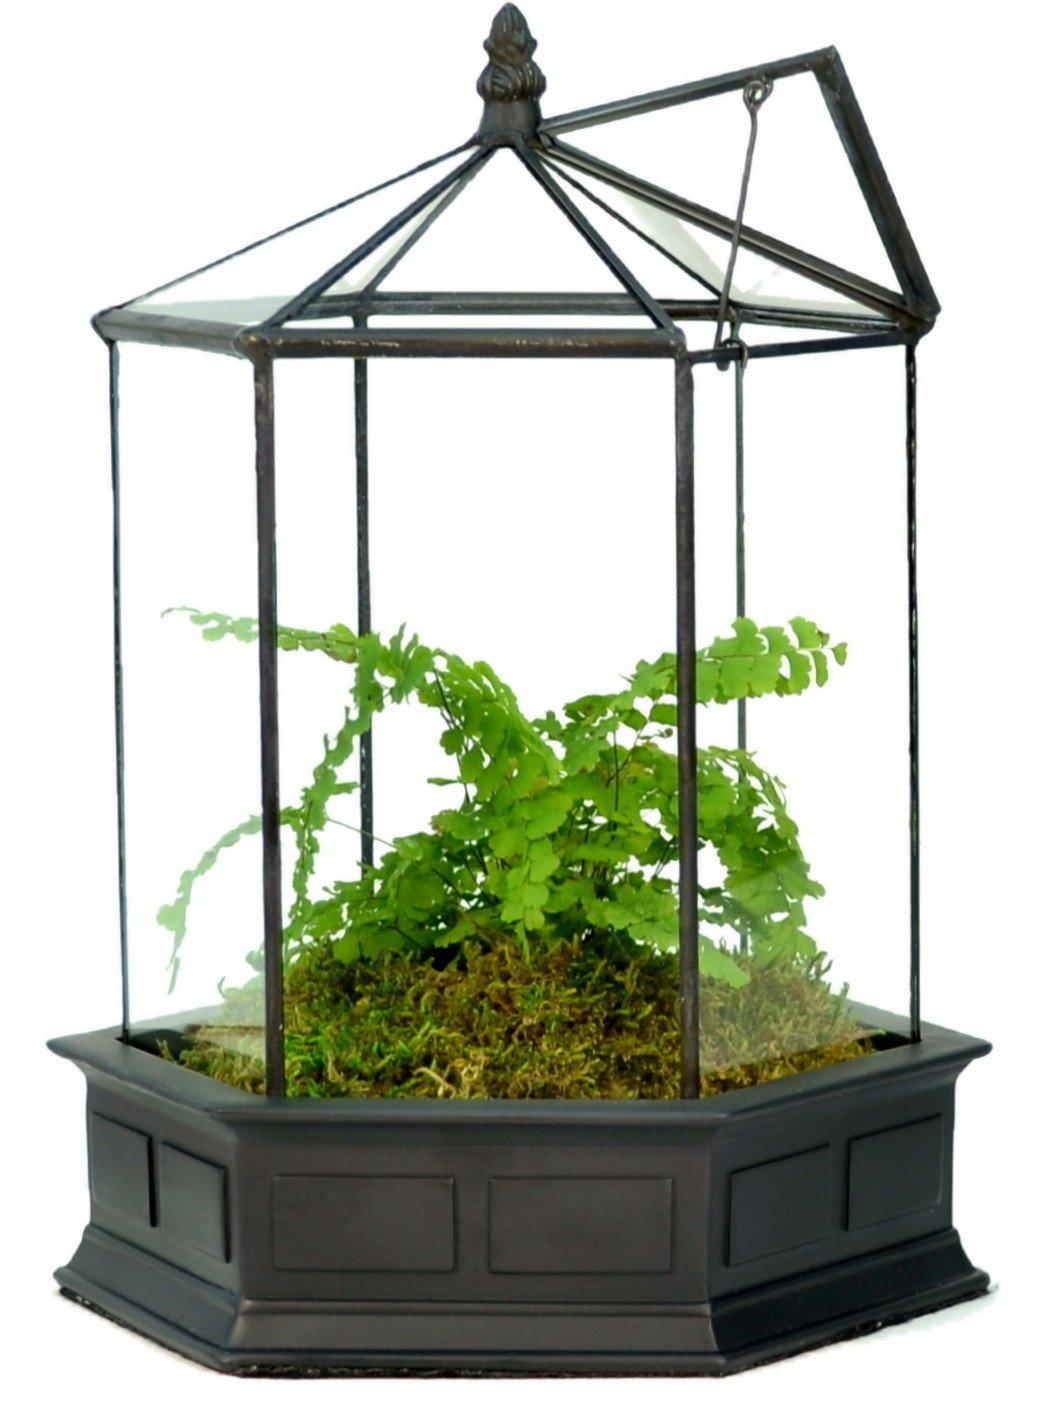 H Potter 6 Sided Glass Terrarium Wardian Case Plant Container Succulent Planter by H Potter